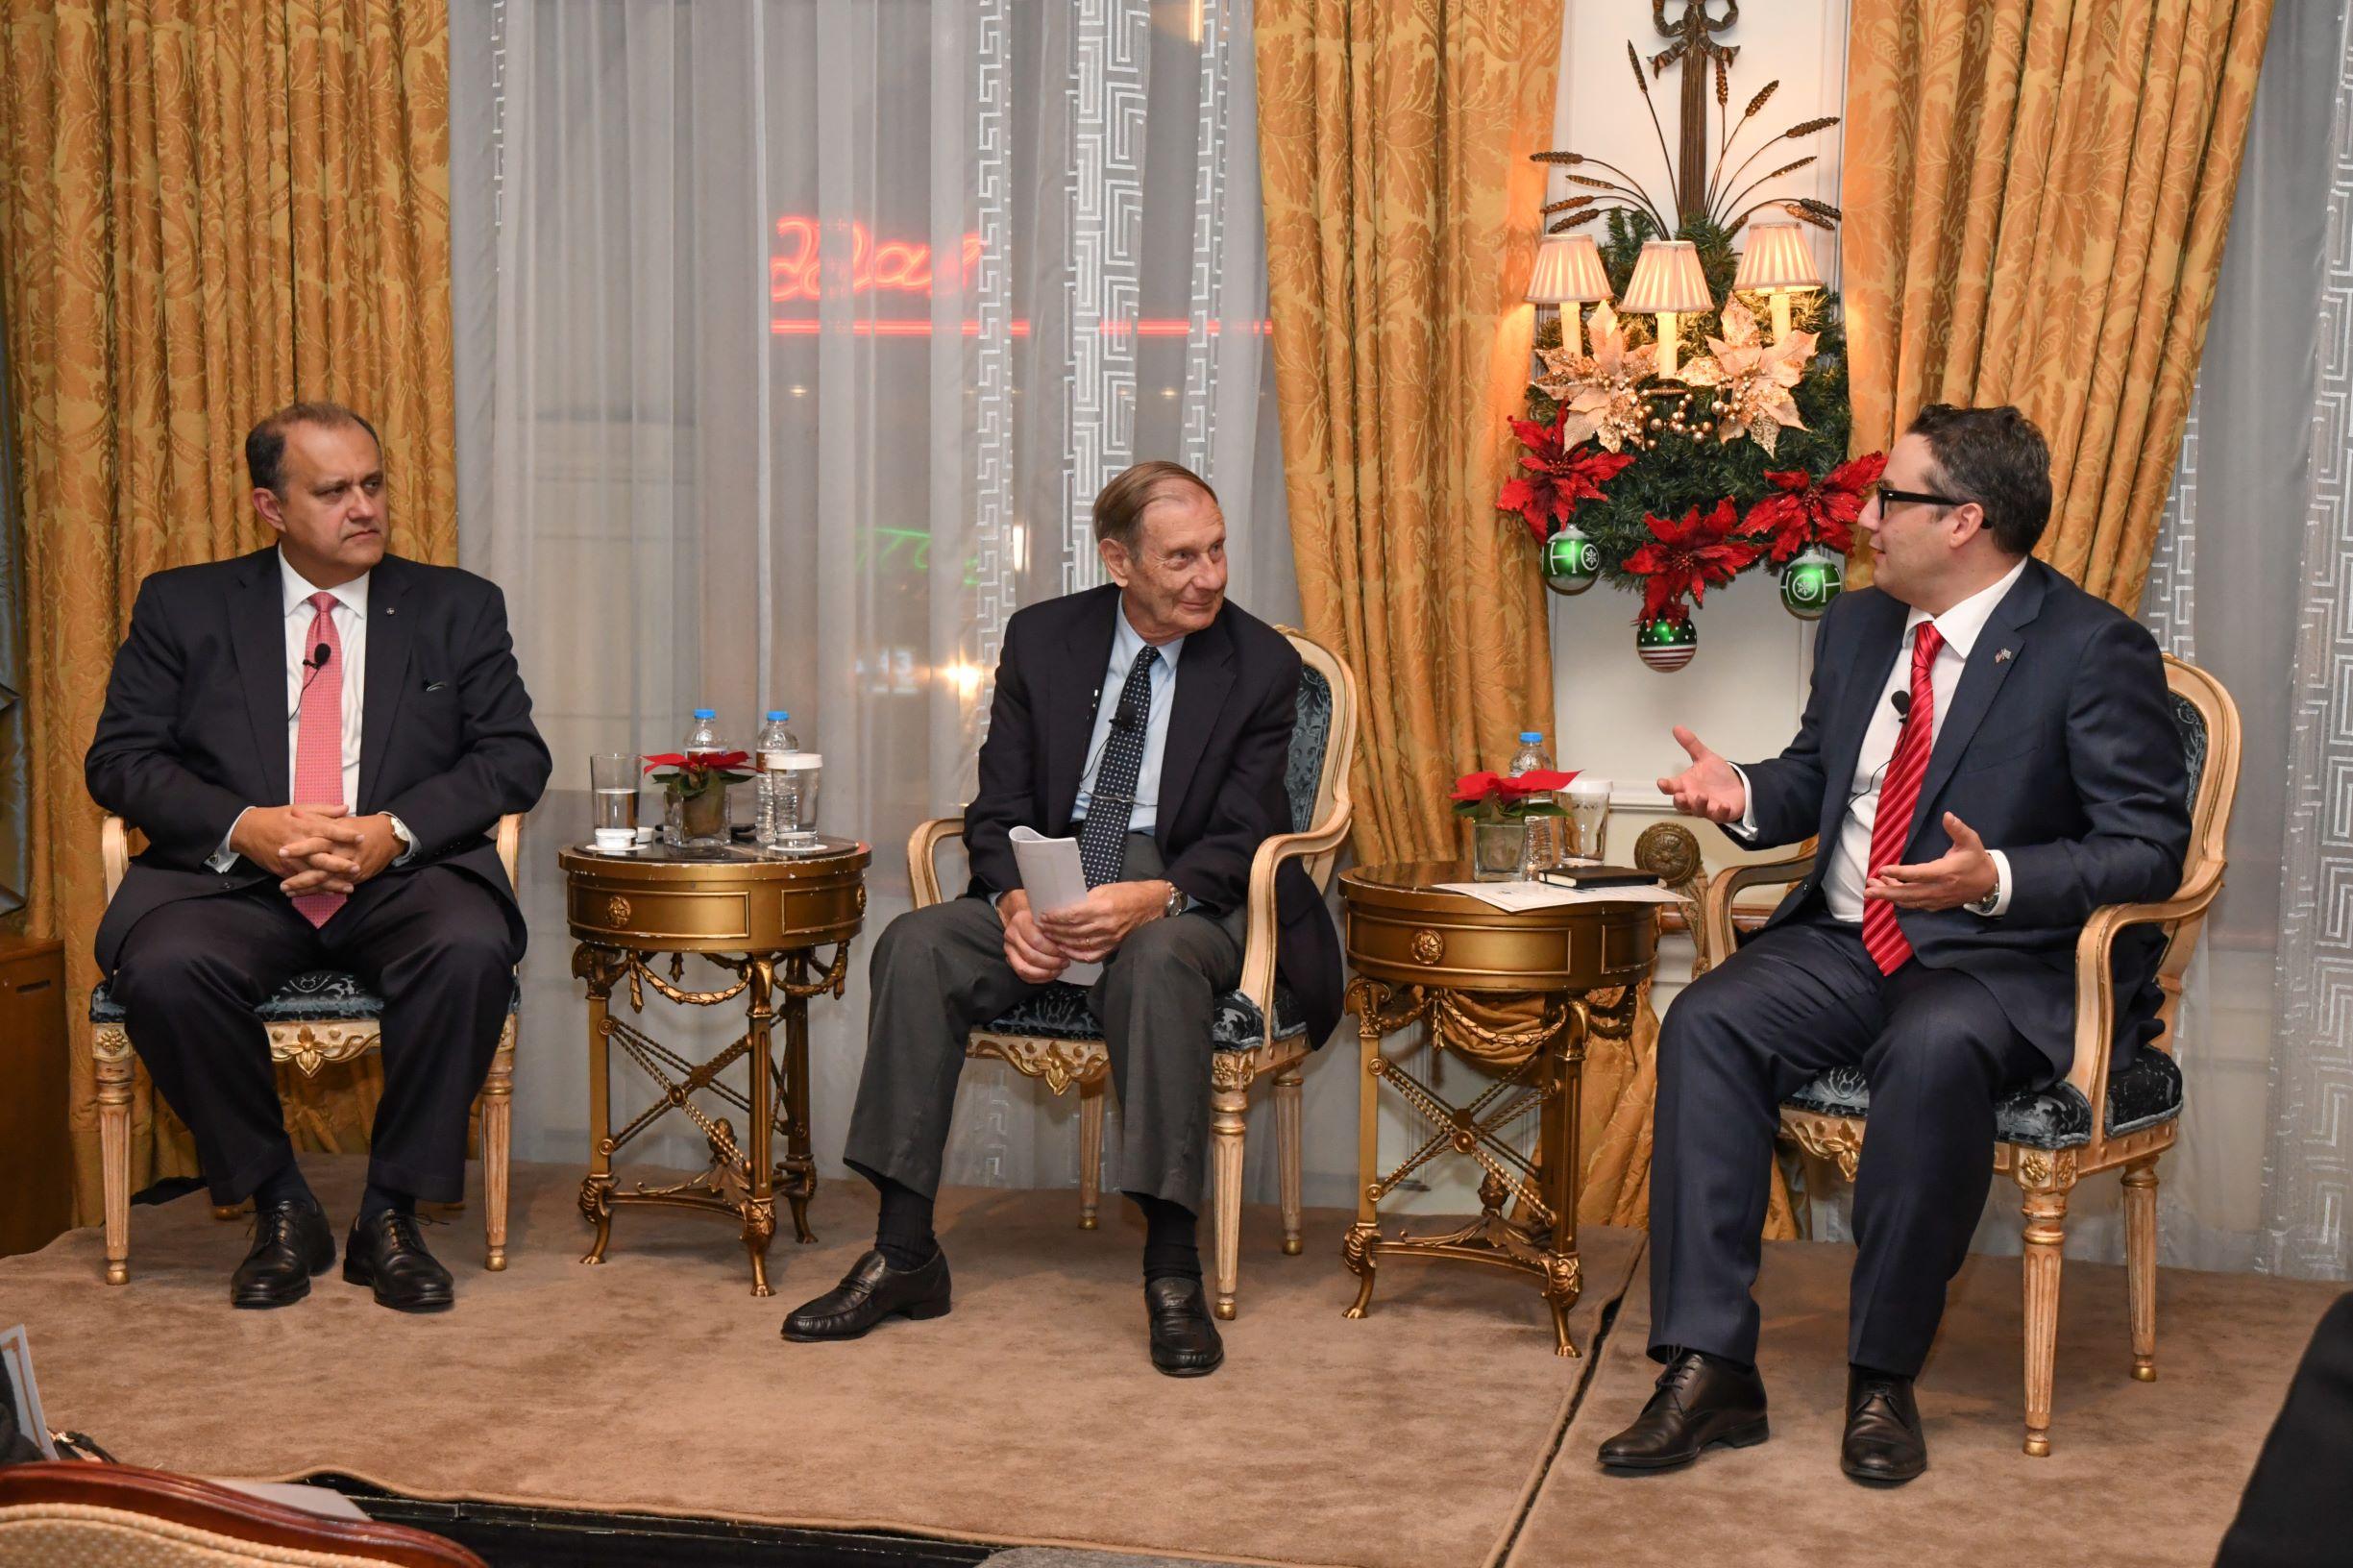 (L-R) President Larigakis, AHI Board Member Dr. Van Coufoudakis, & Panel Moderator Dr. Aristotle Tziampiris